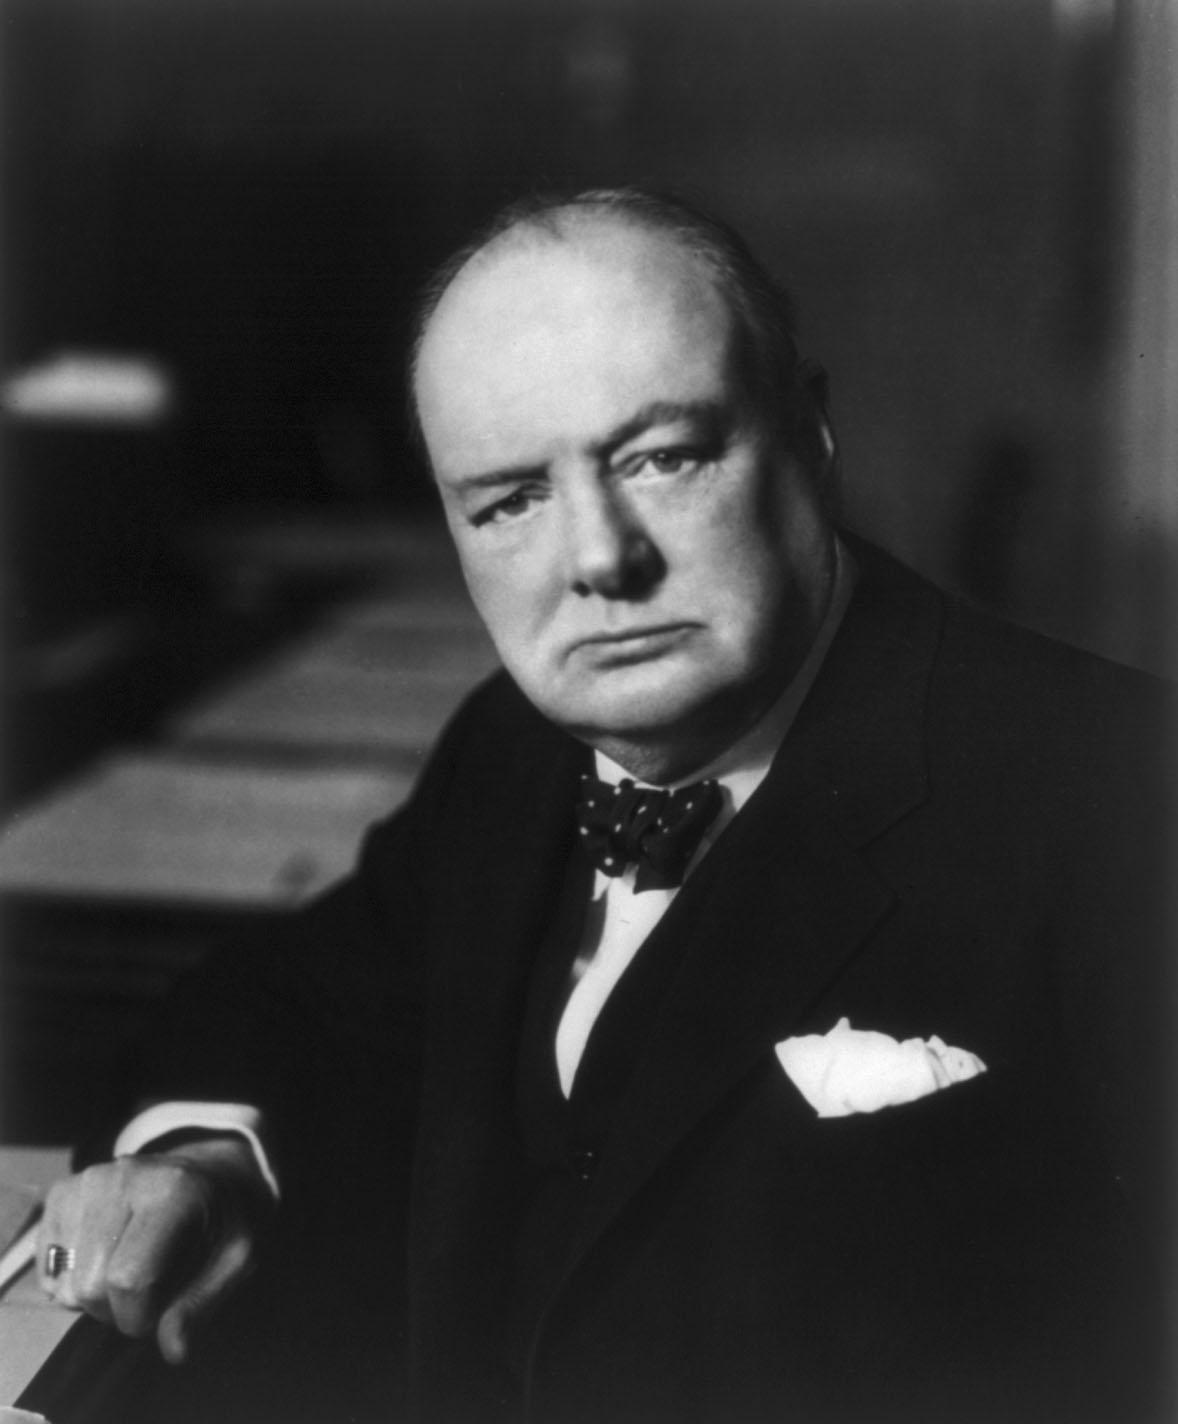 Winston Churchill famous portrait prime minister